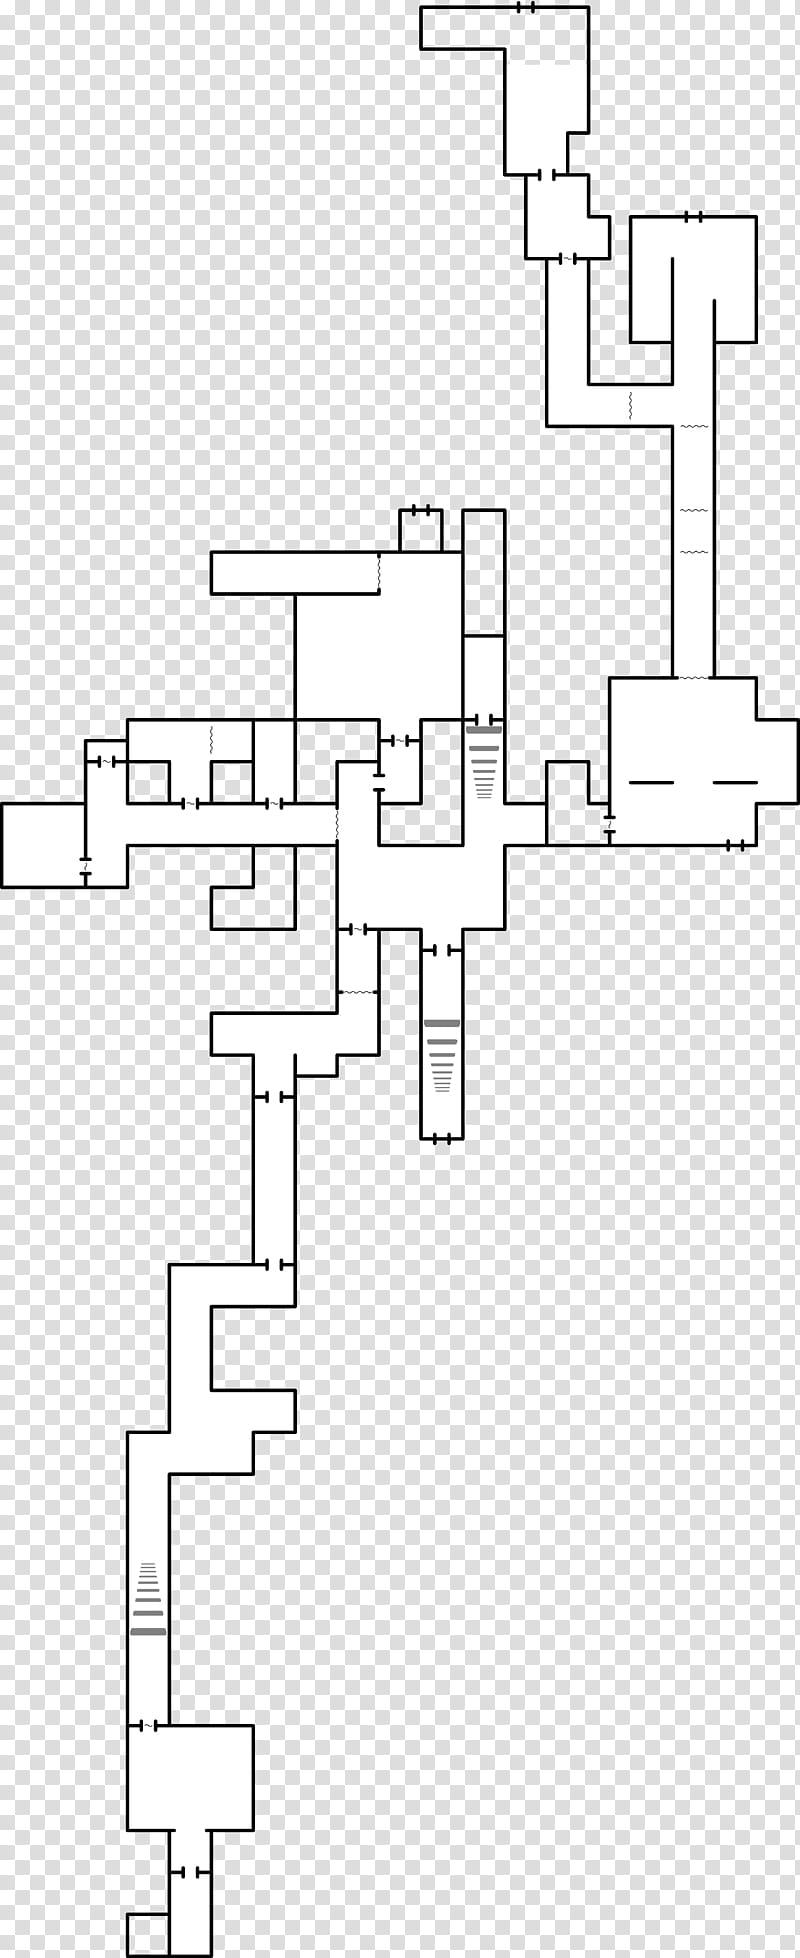 Chapter v map layout, white and black illustration.